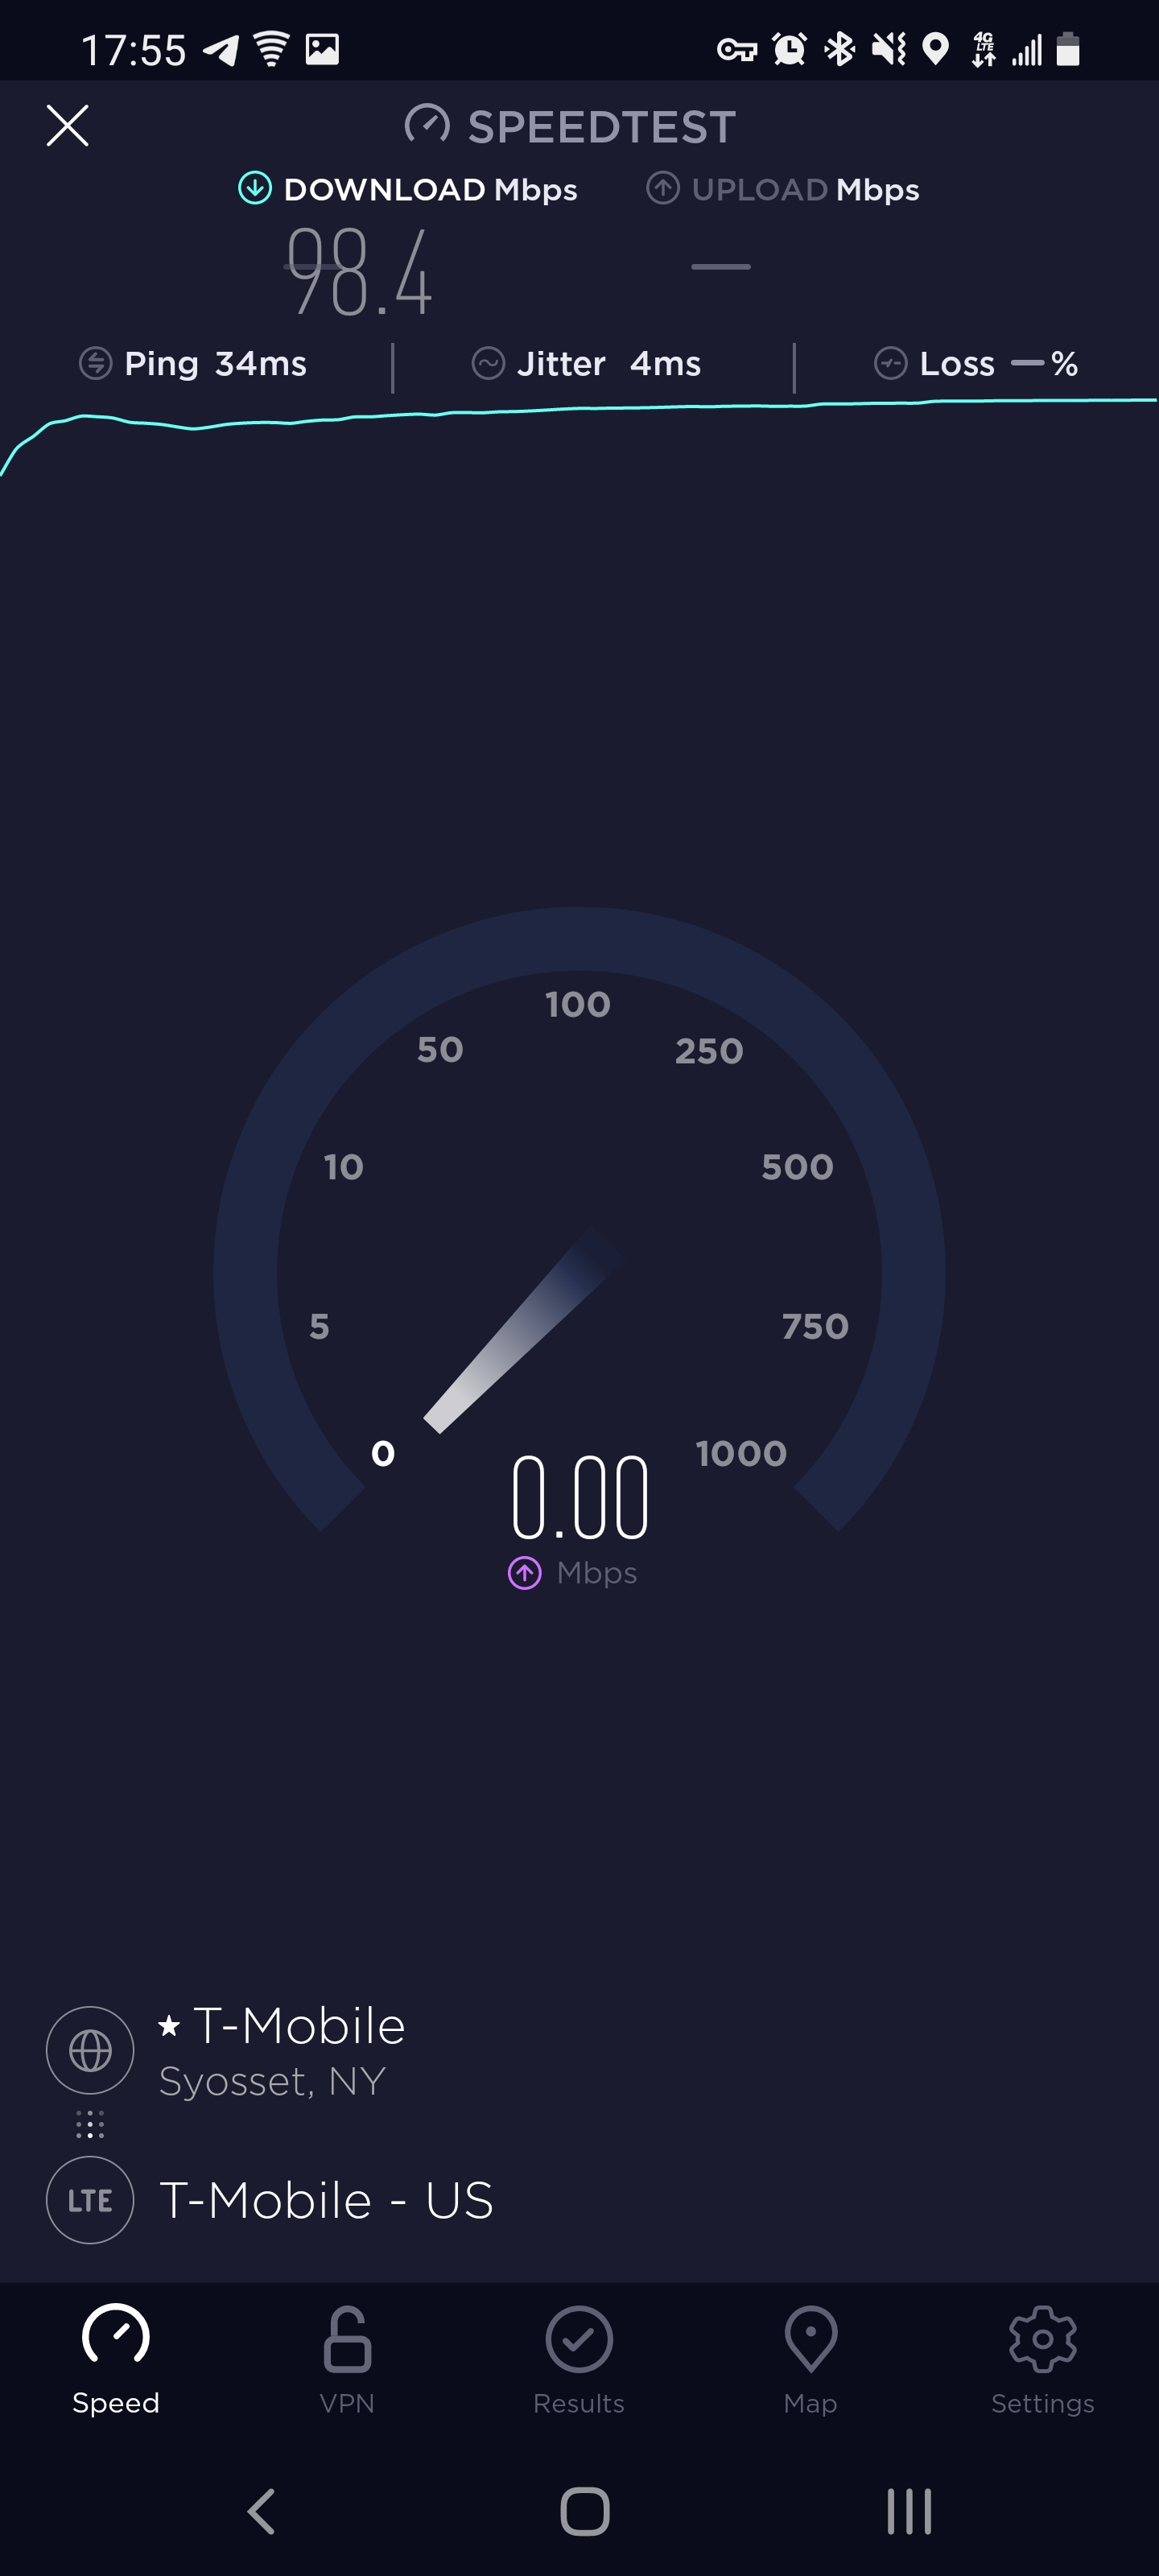 Screenshot-20210501-175505-Speedtest.jpg